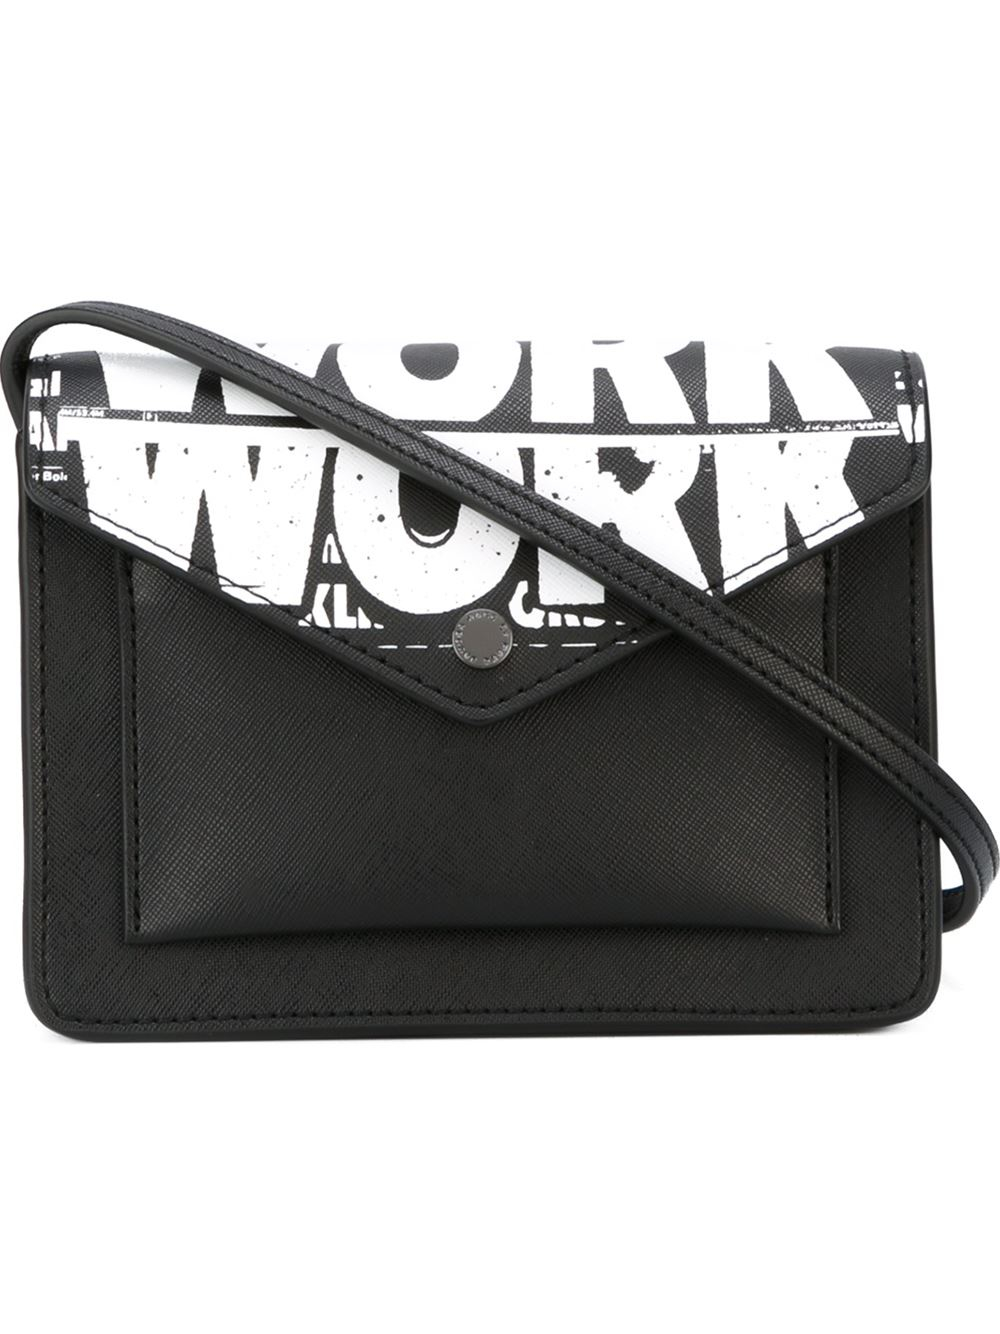 5925349108db Lyst - Marc By Marc Jacobs Work Print Crossbody Bag in Black